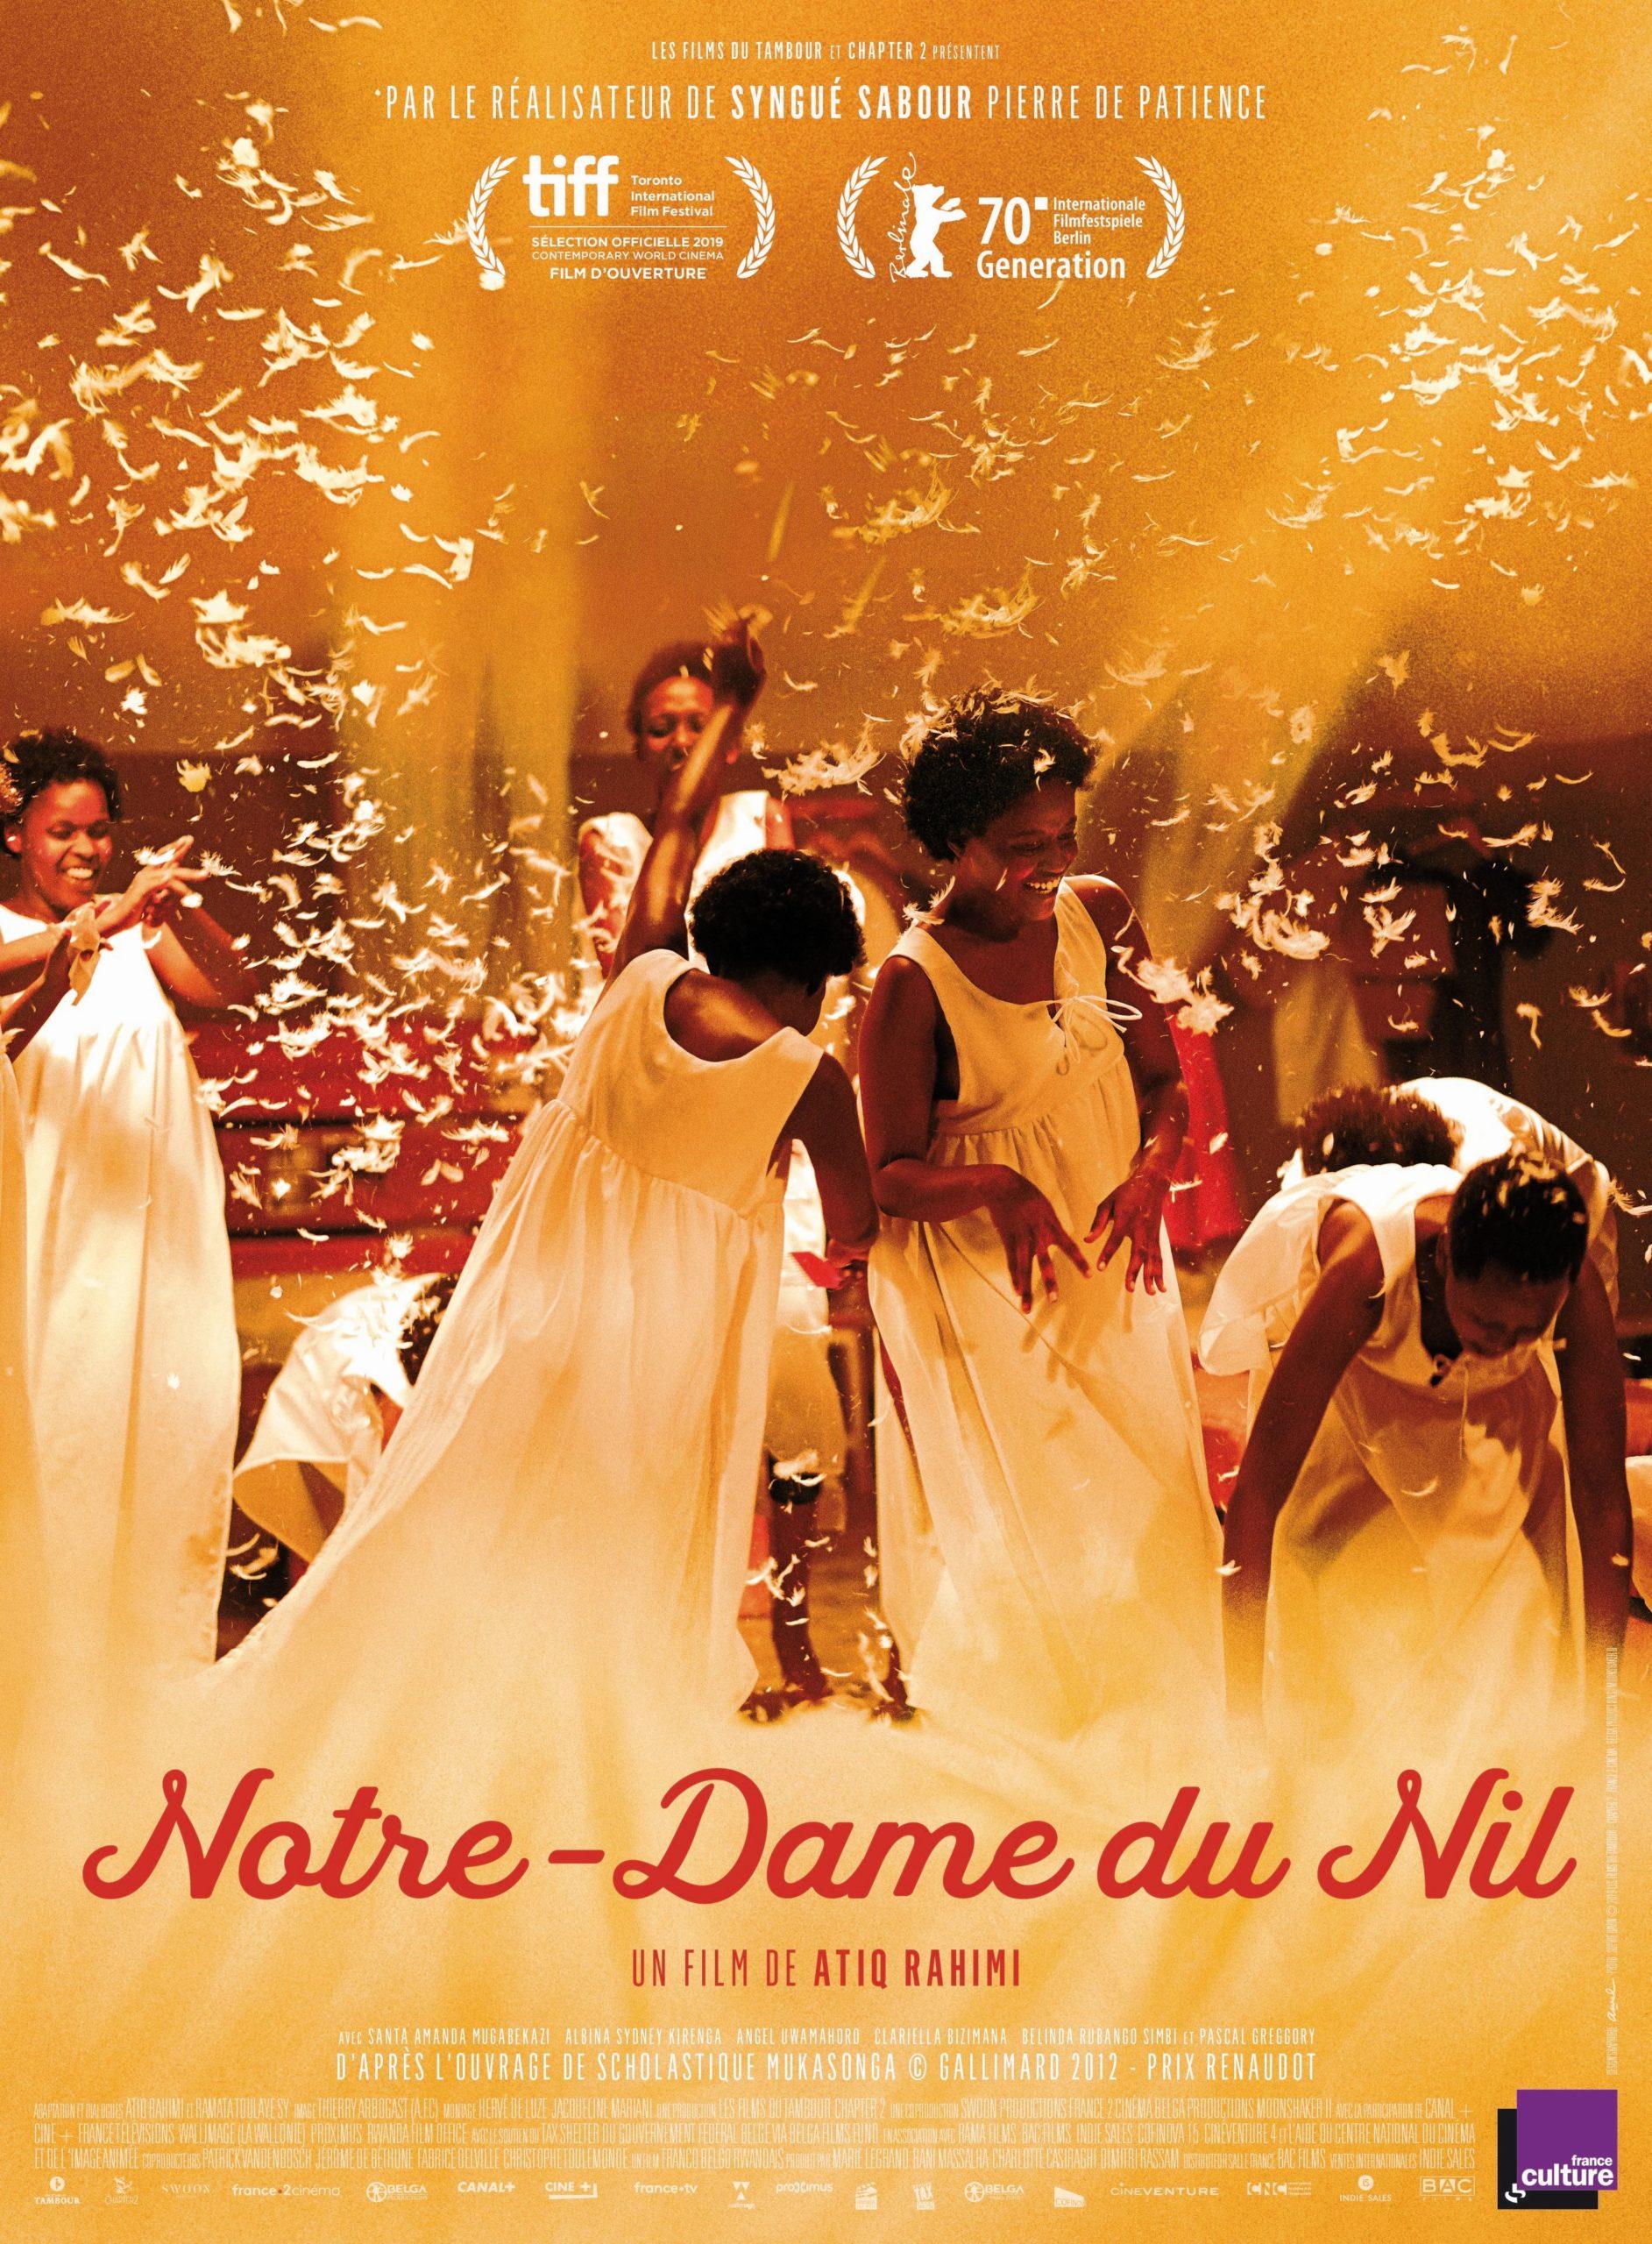 Notre-Dame du Nil / Maria Panna Nilu